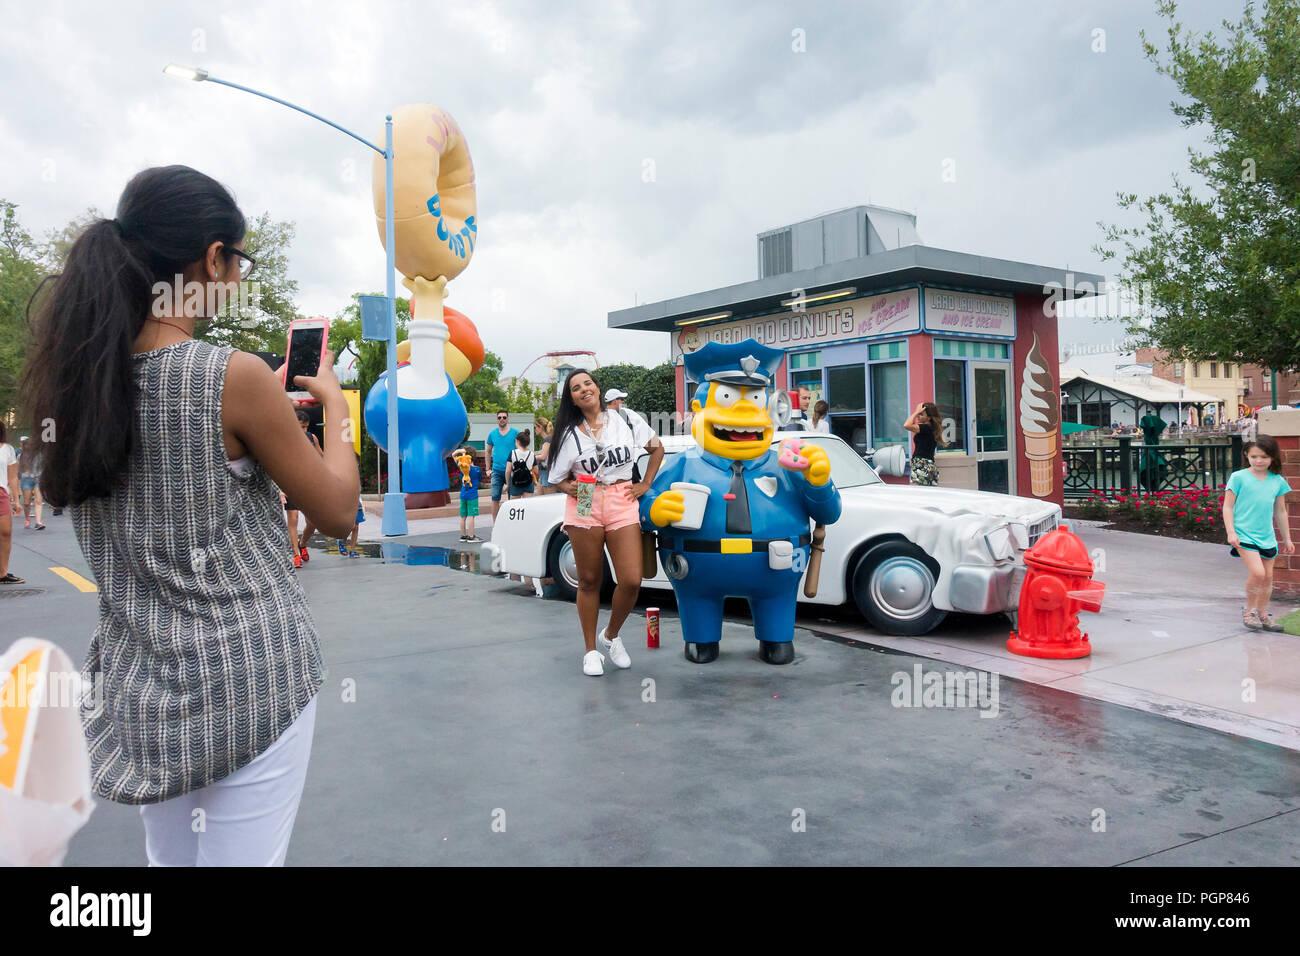 Woman taking a picture at Springfield USA, Universal Studios Florida - Orlando, Florida USA - Stock Image